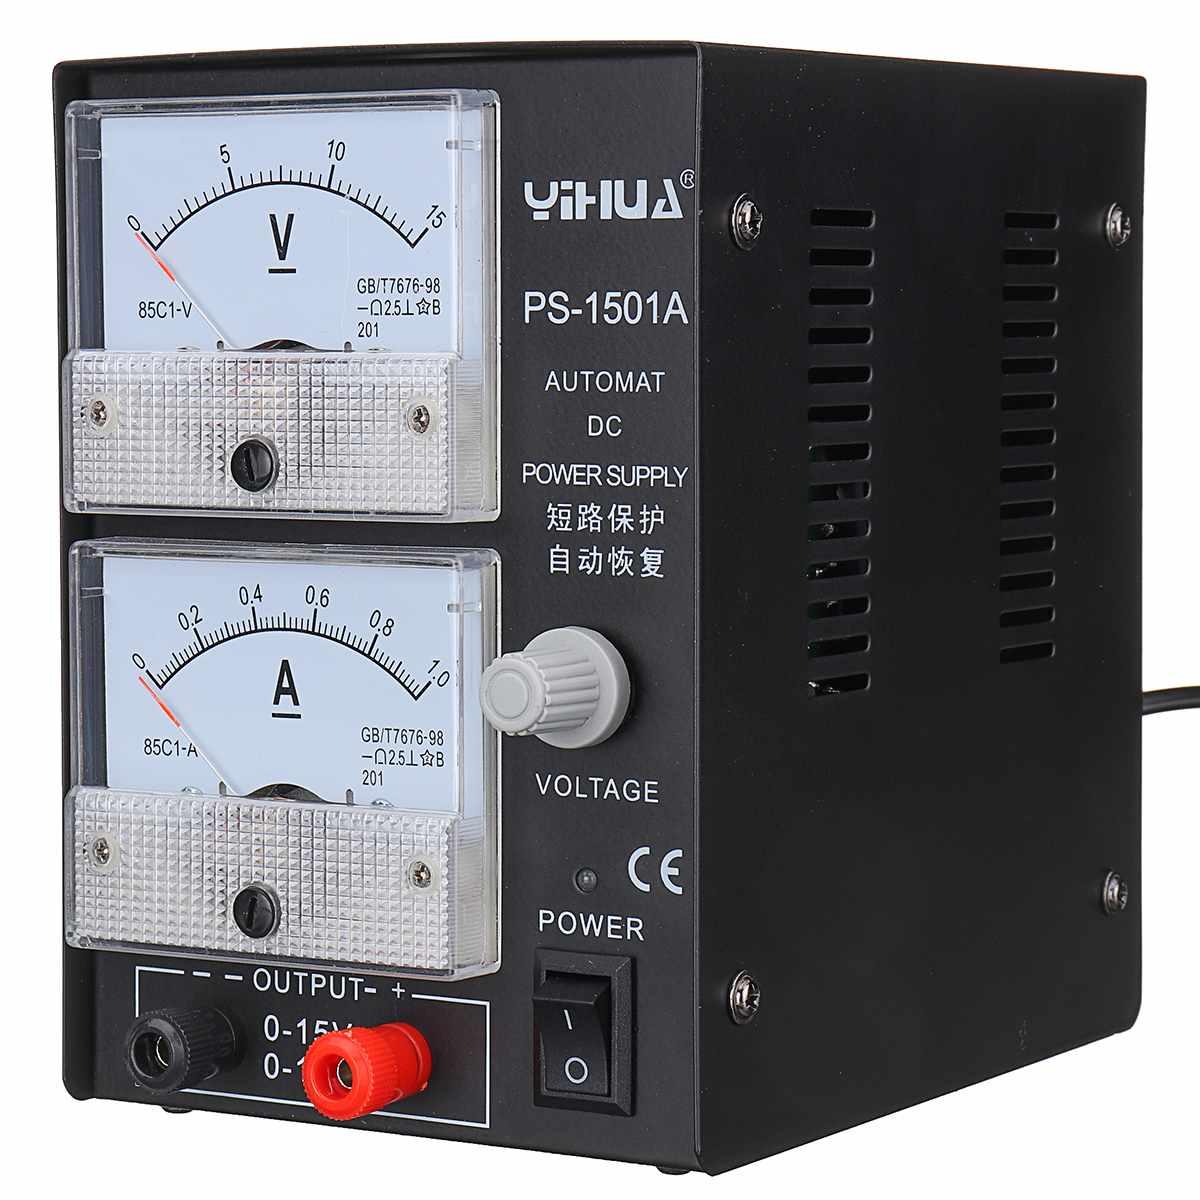 15V/1A Adjustable Switching Regulator DC Power Supply for motor,  fan, car DVD Laptop Repair Rework 110v - 220v15V/1A Adjustable Switching Regulator DC Power Supply for motor,  fan, car DVD Laptop Repair Rework 110v - 220v